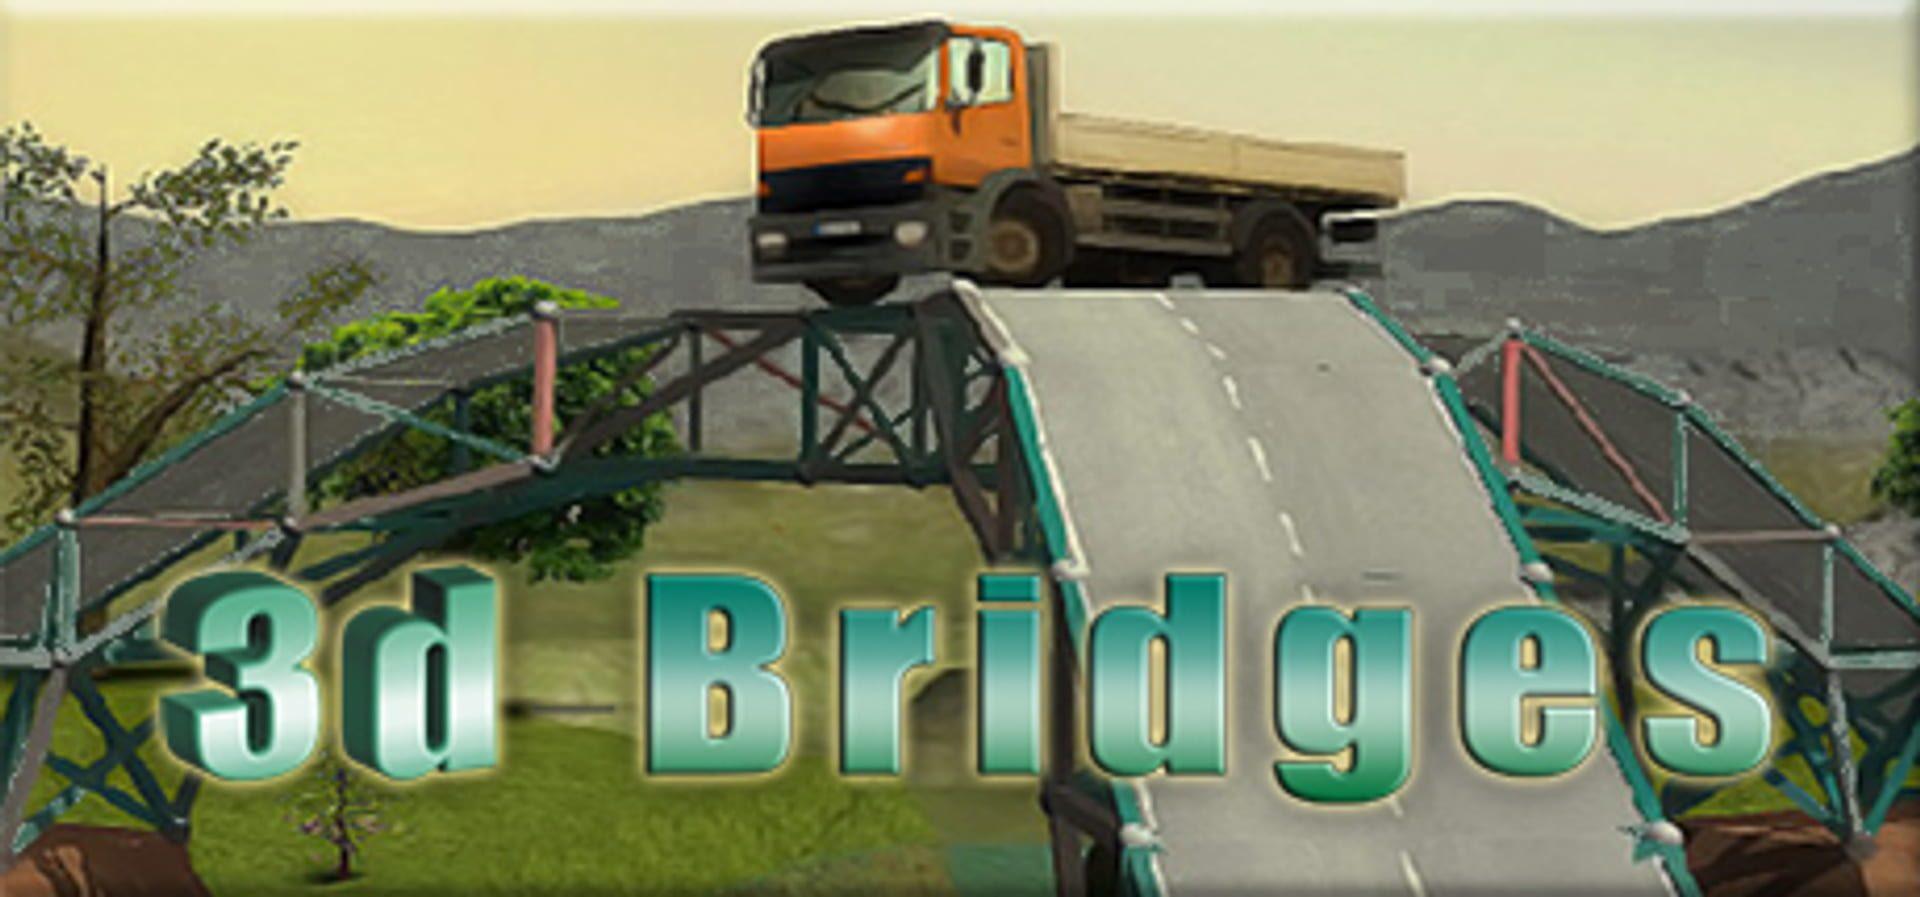 buy 3d Bridges cd key for pc platform